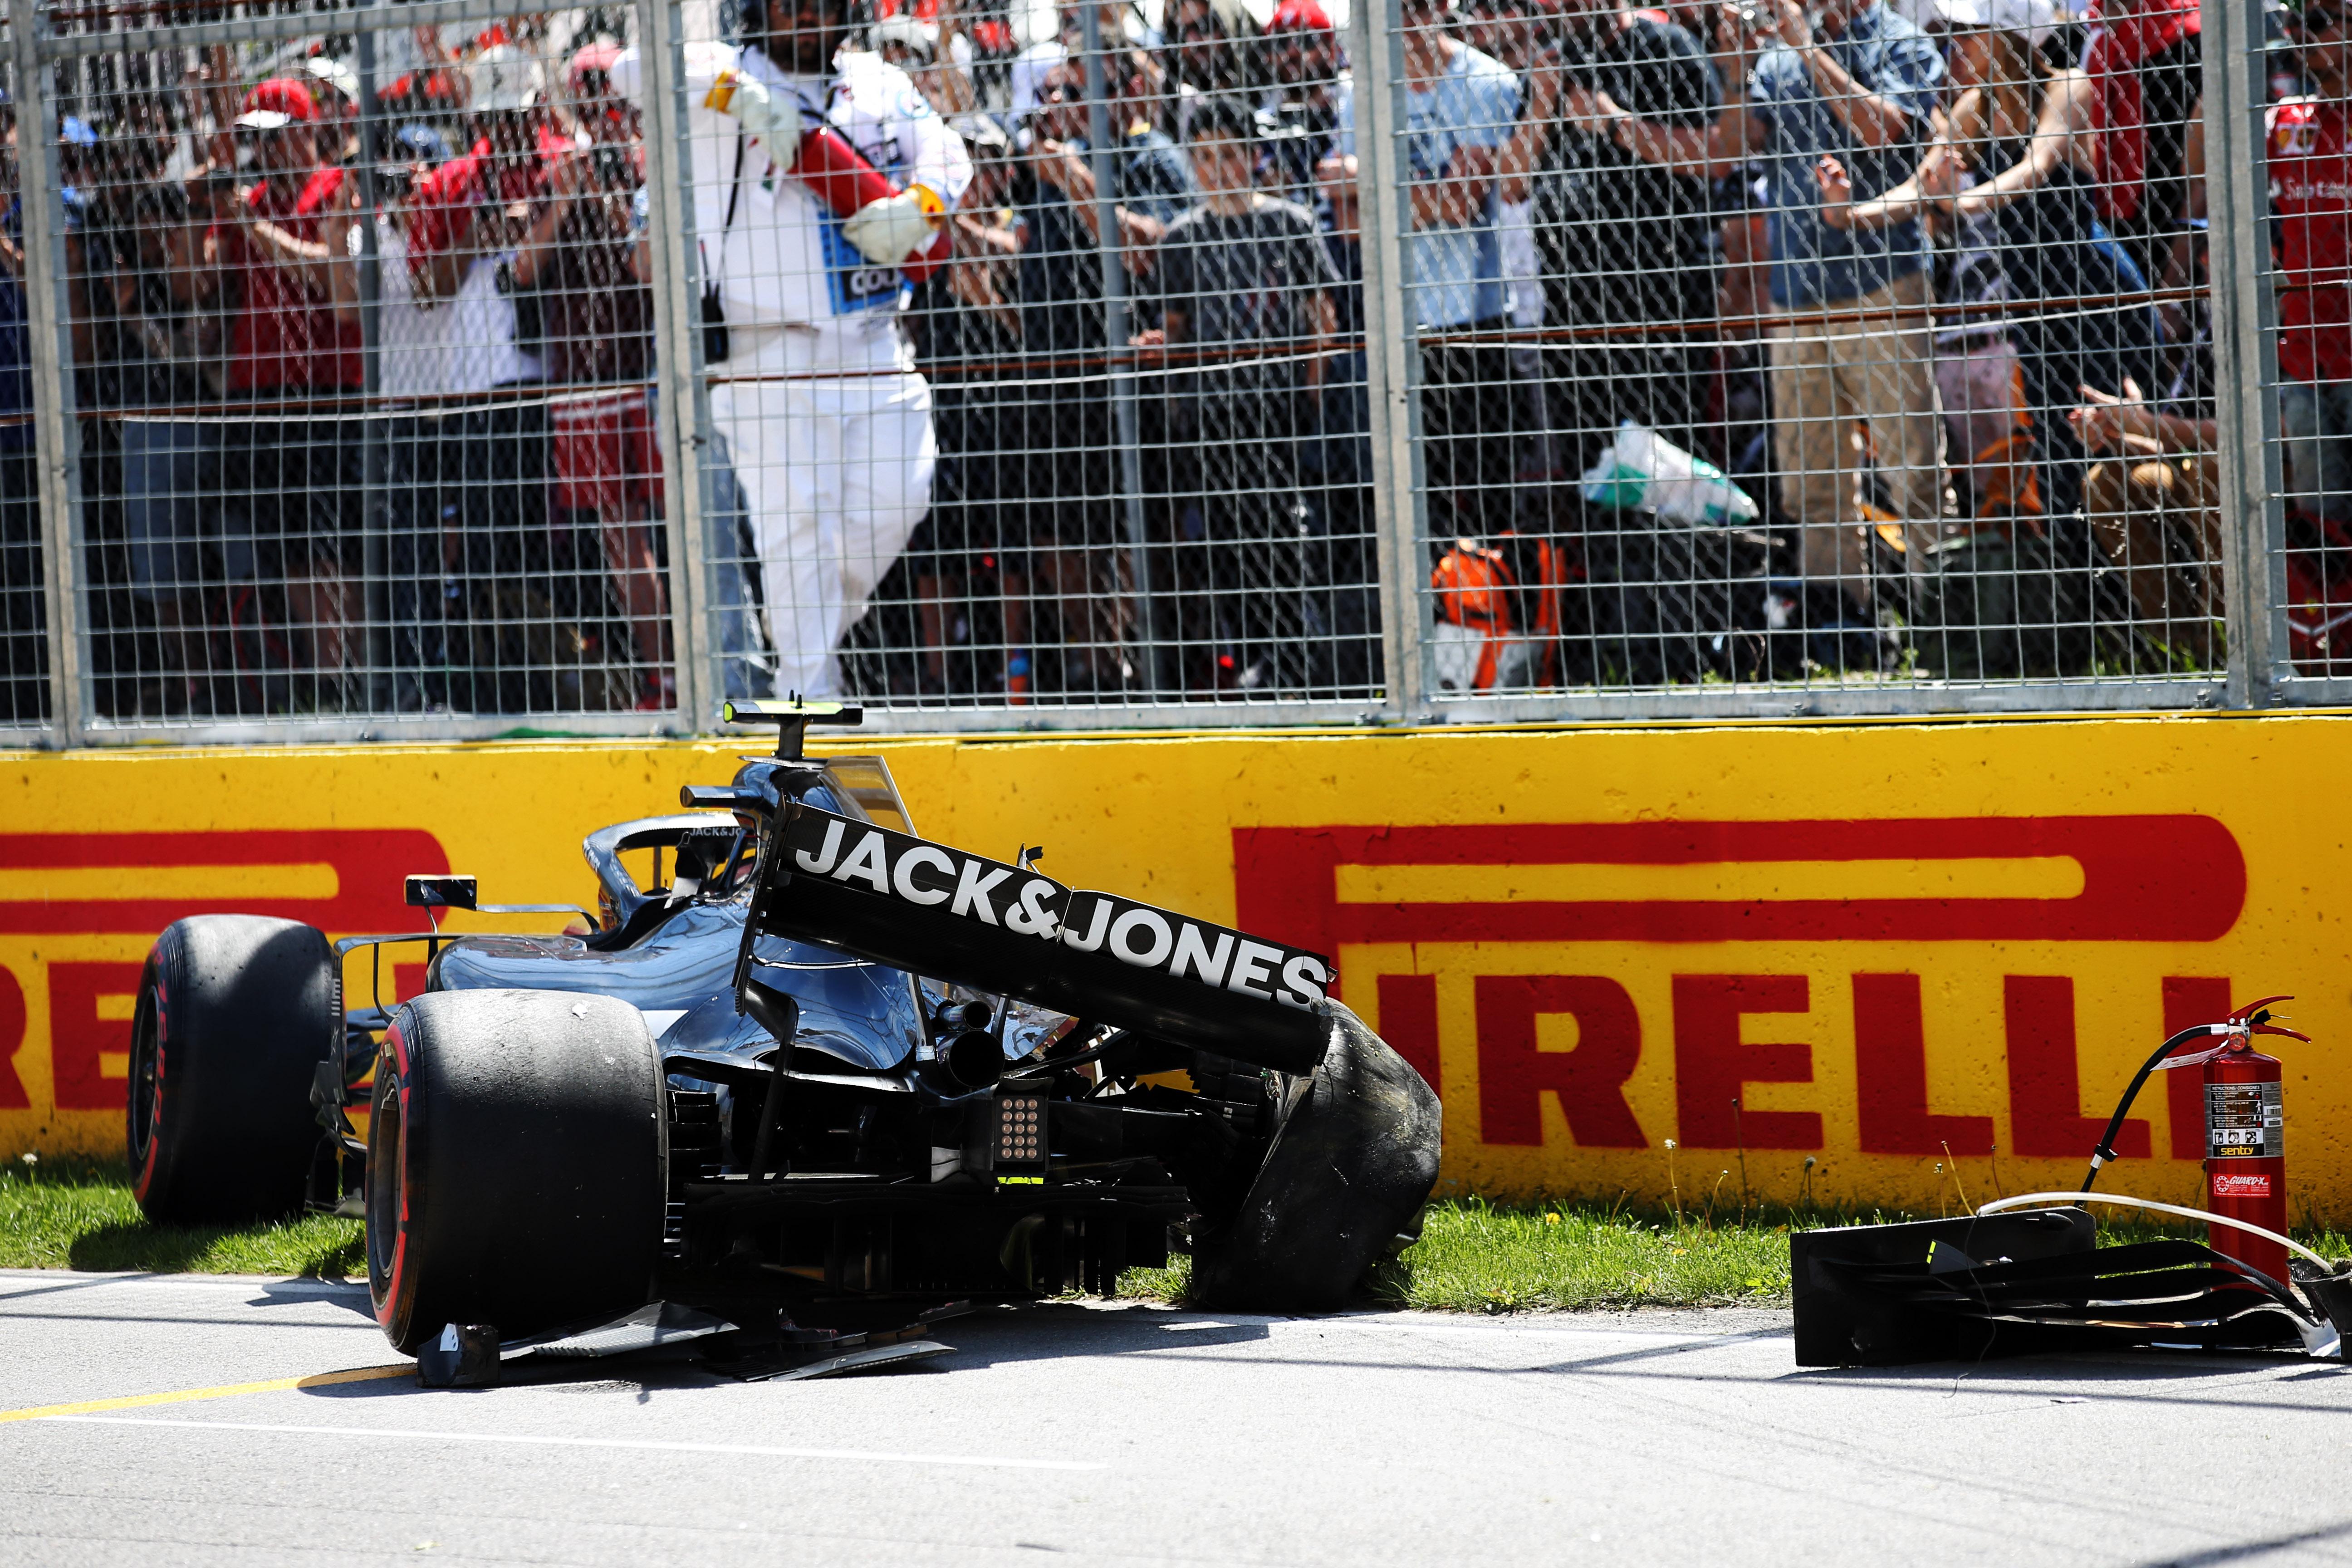 Motor Racing Formula One World Championship Canadian Grand Prix Qualifying Day Montreal, Canada